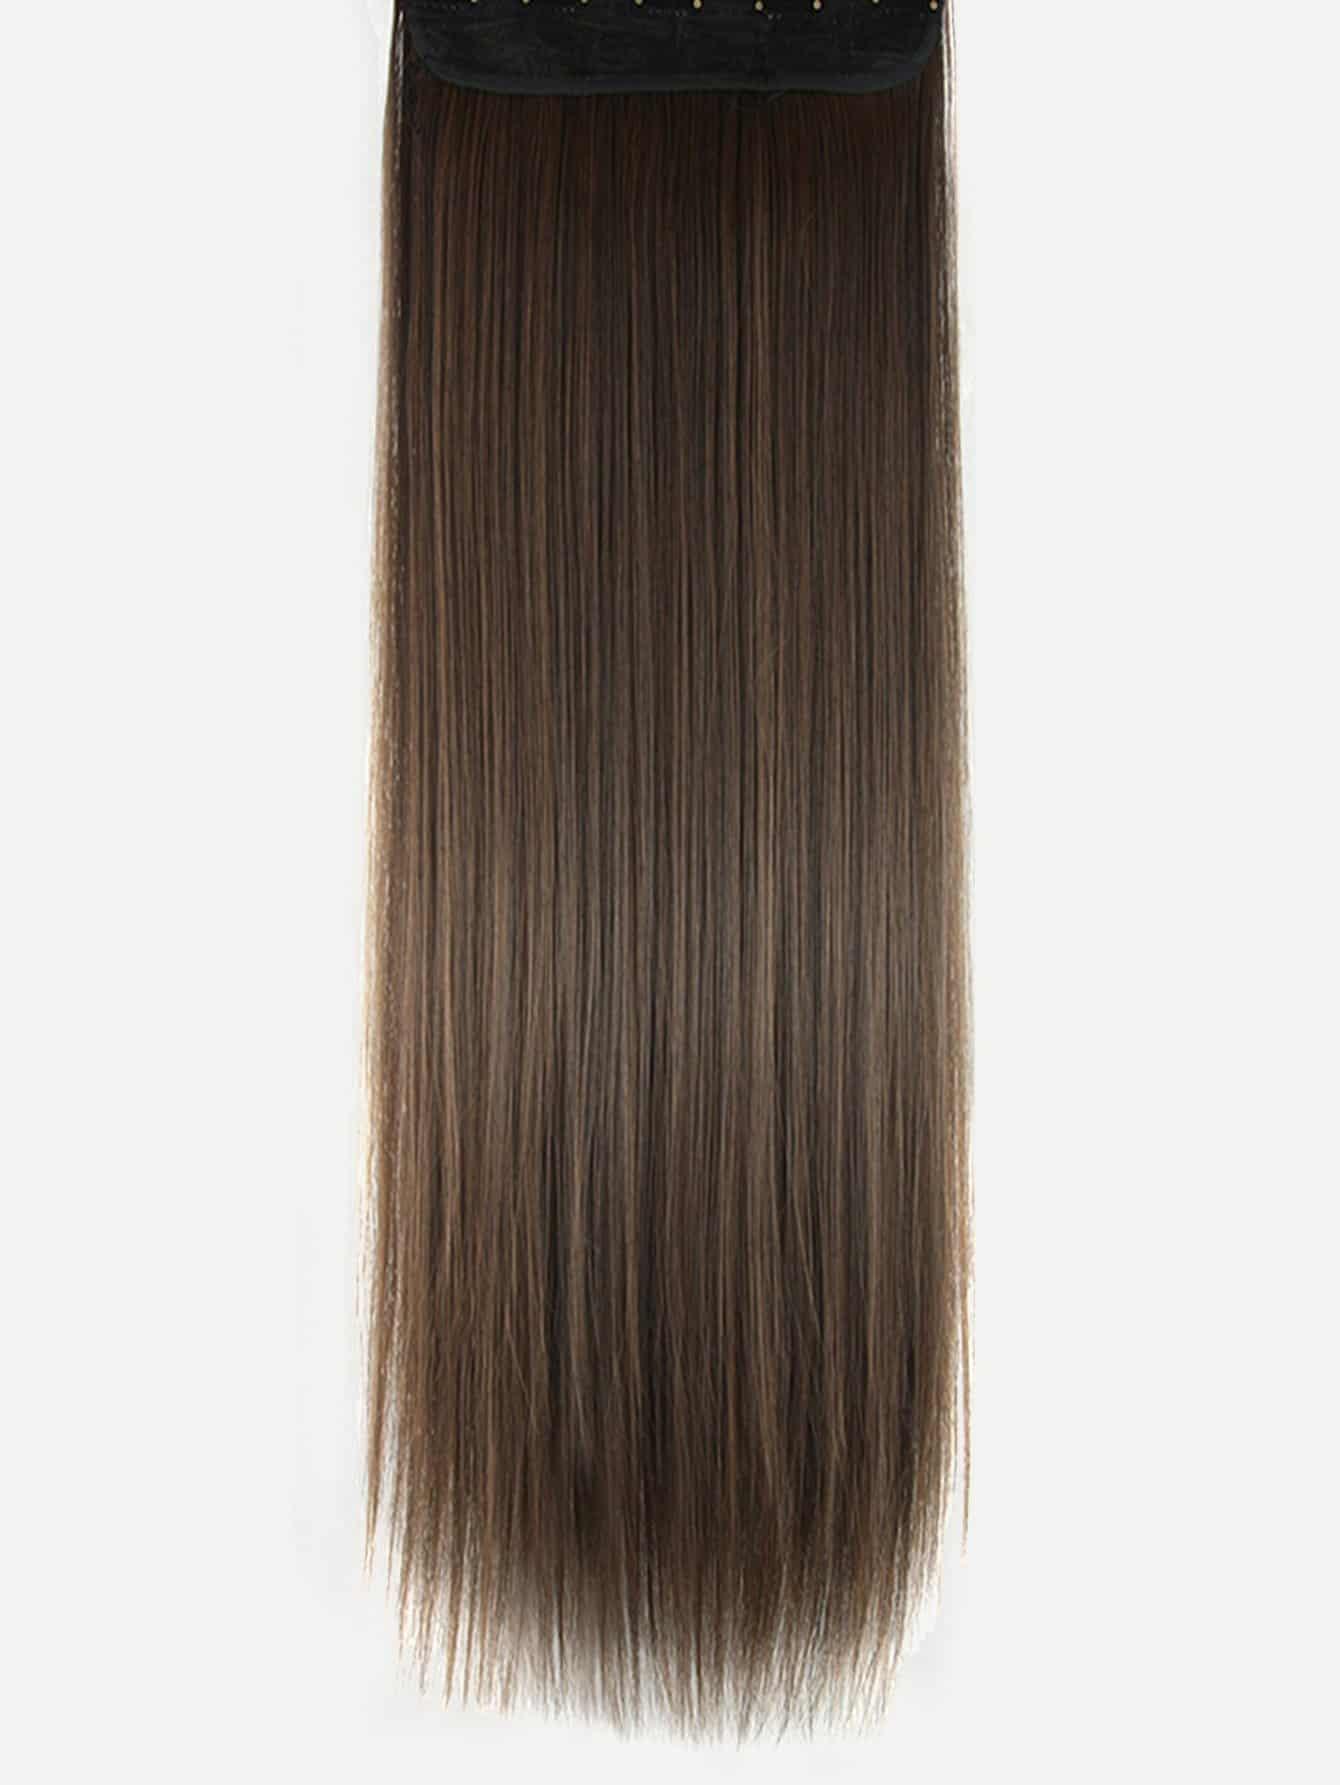 Straight Hair Extension 1pcsfor Women Romwe